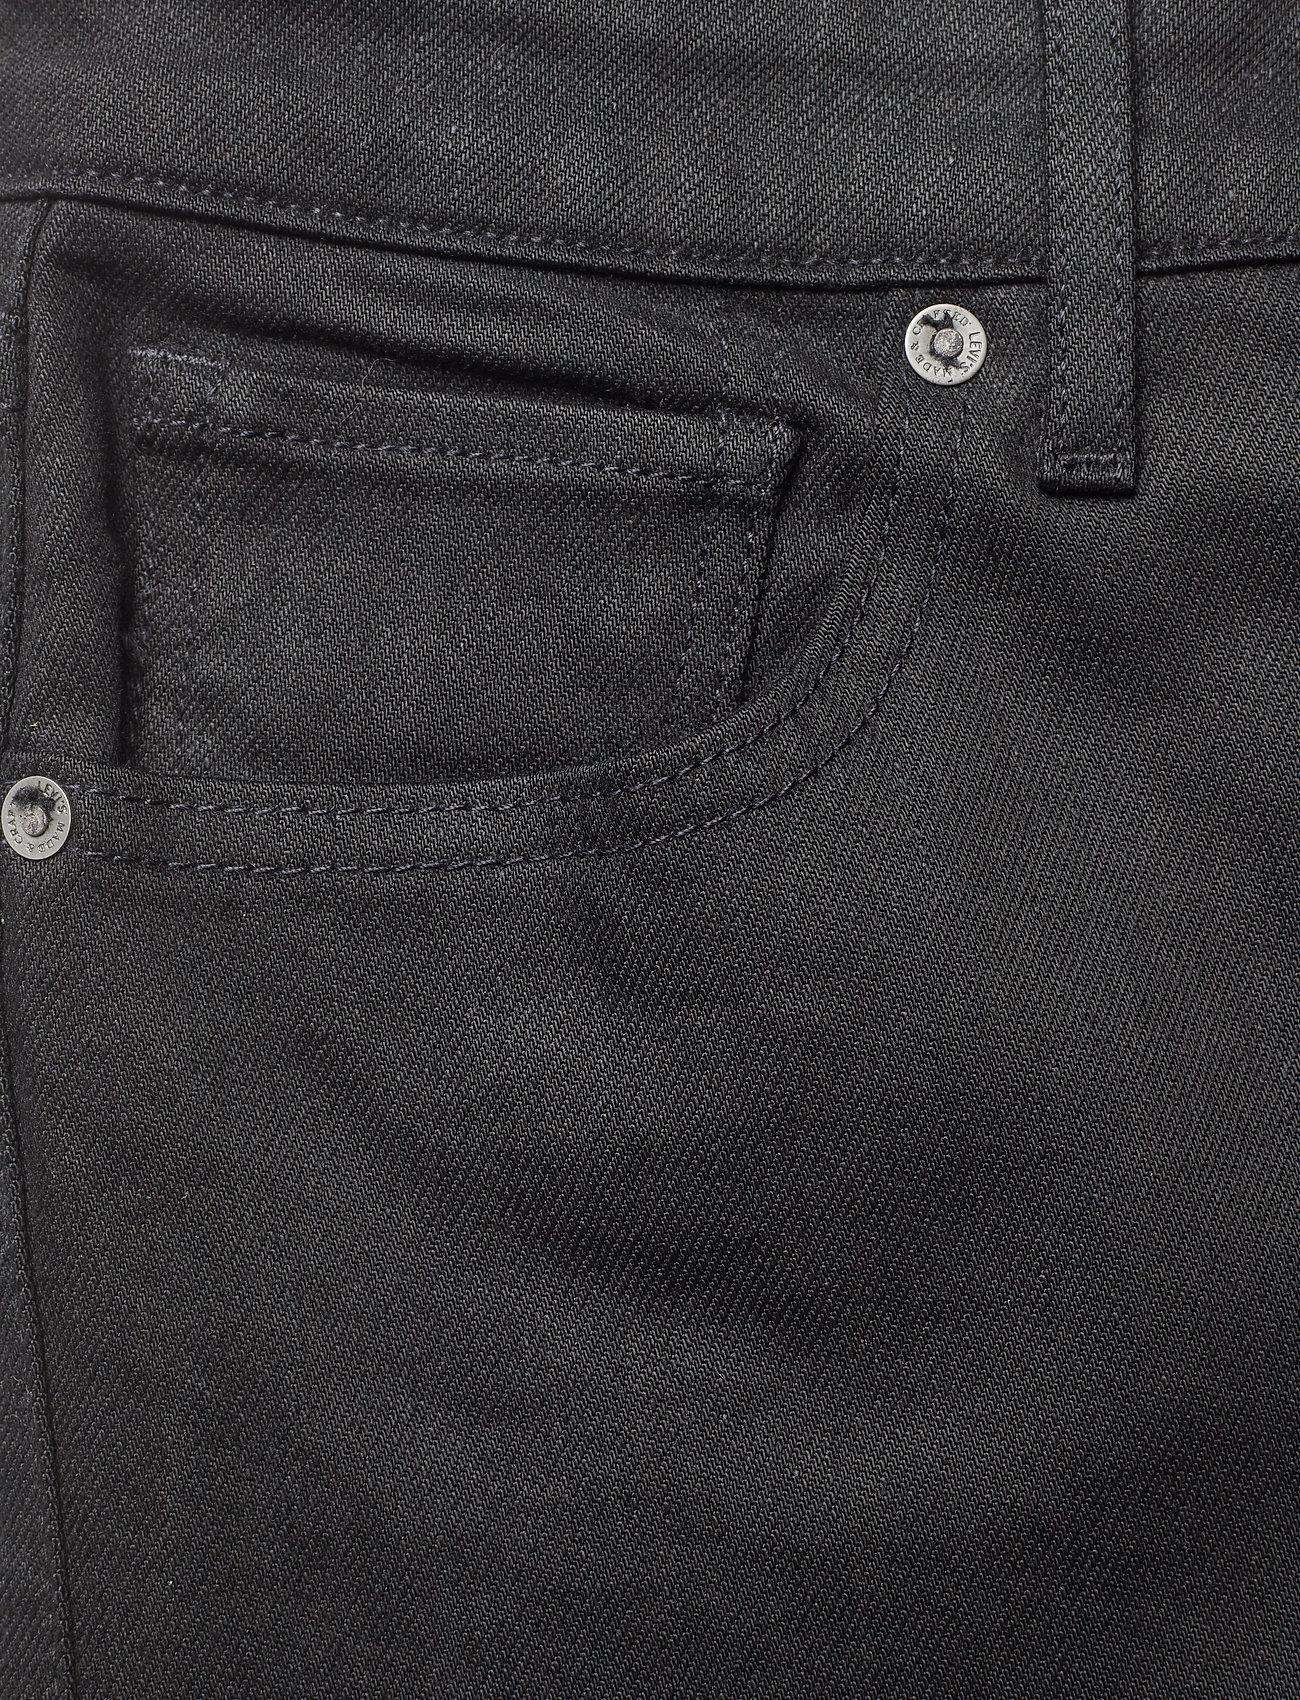 Levi's Made & Crafted - LMC 721 LMC STAY BLACK - skinny jeans - blacks - 2